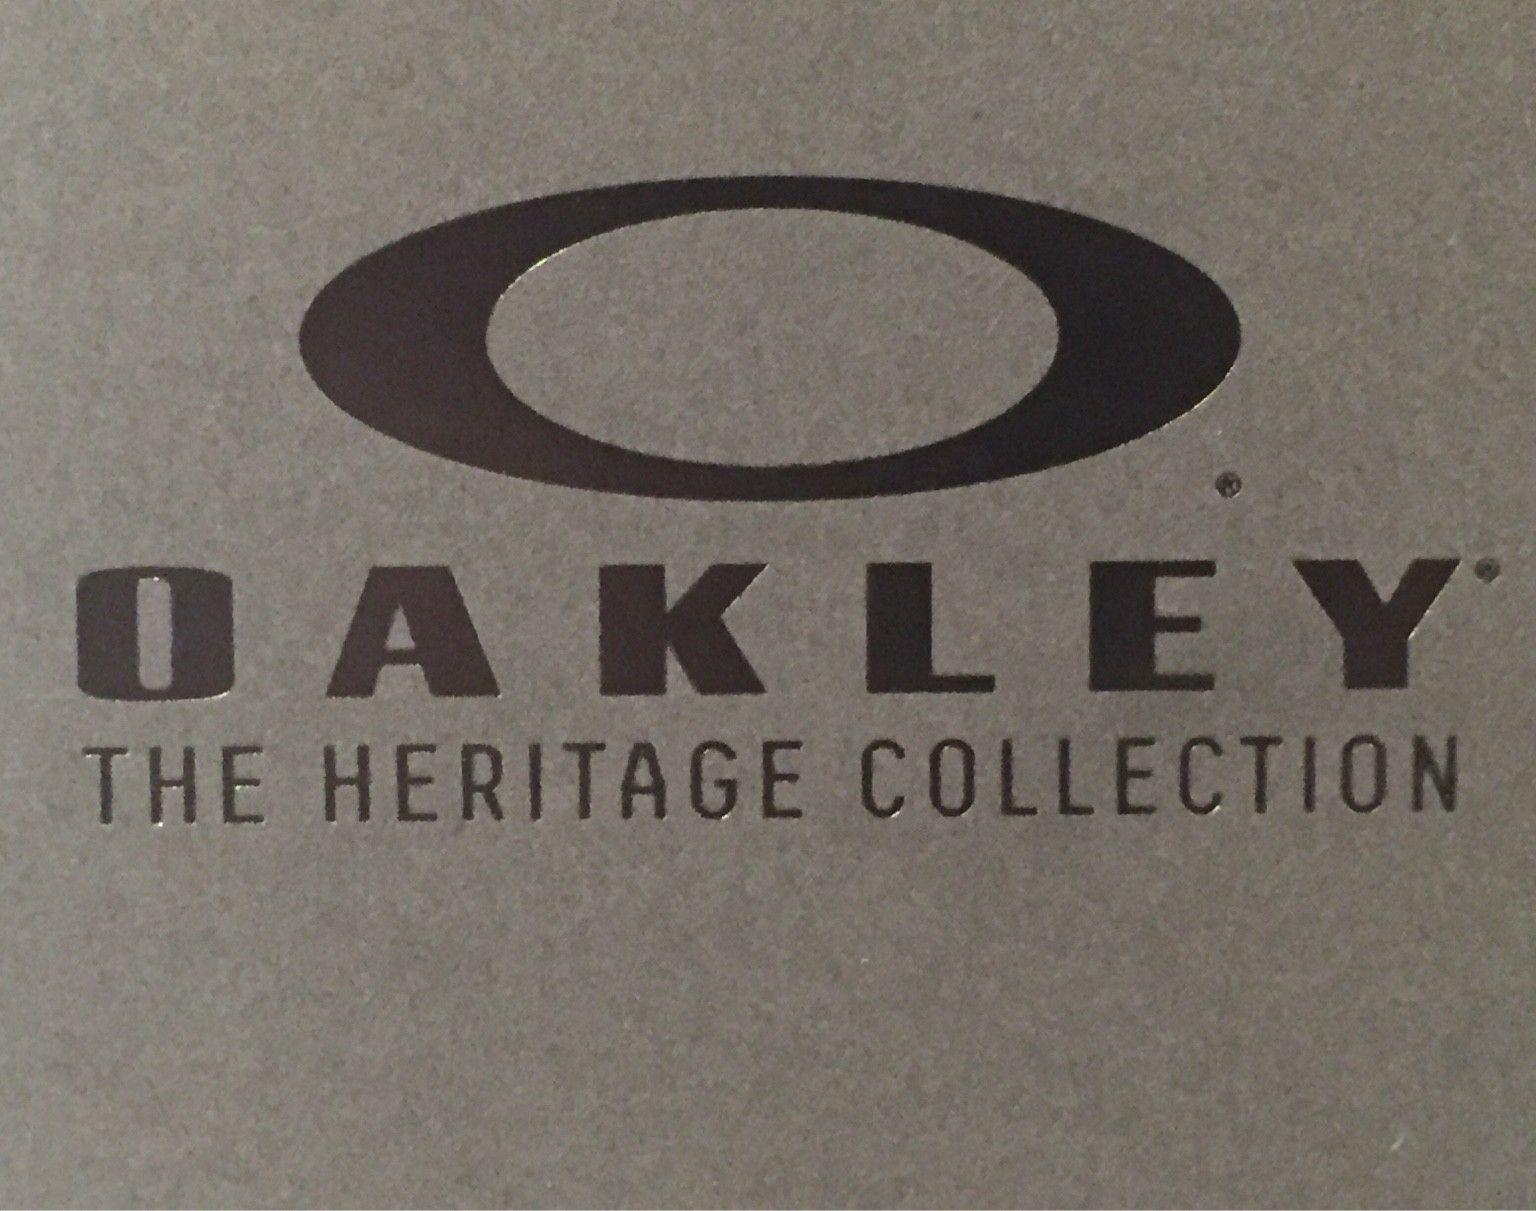 Oakley Heritage Box Set - 8739b9e9a7aa9f80a2dff5338f5479ca.jpg